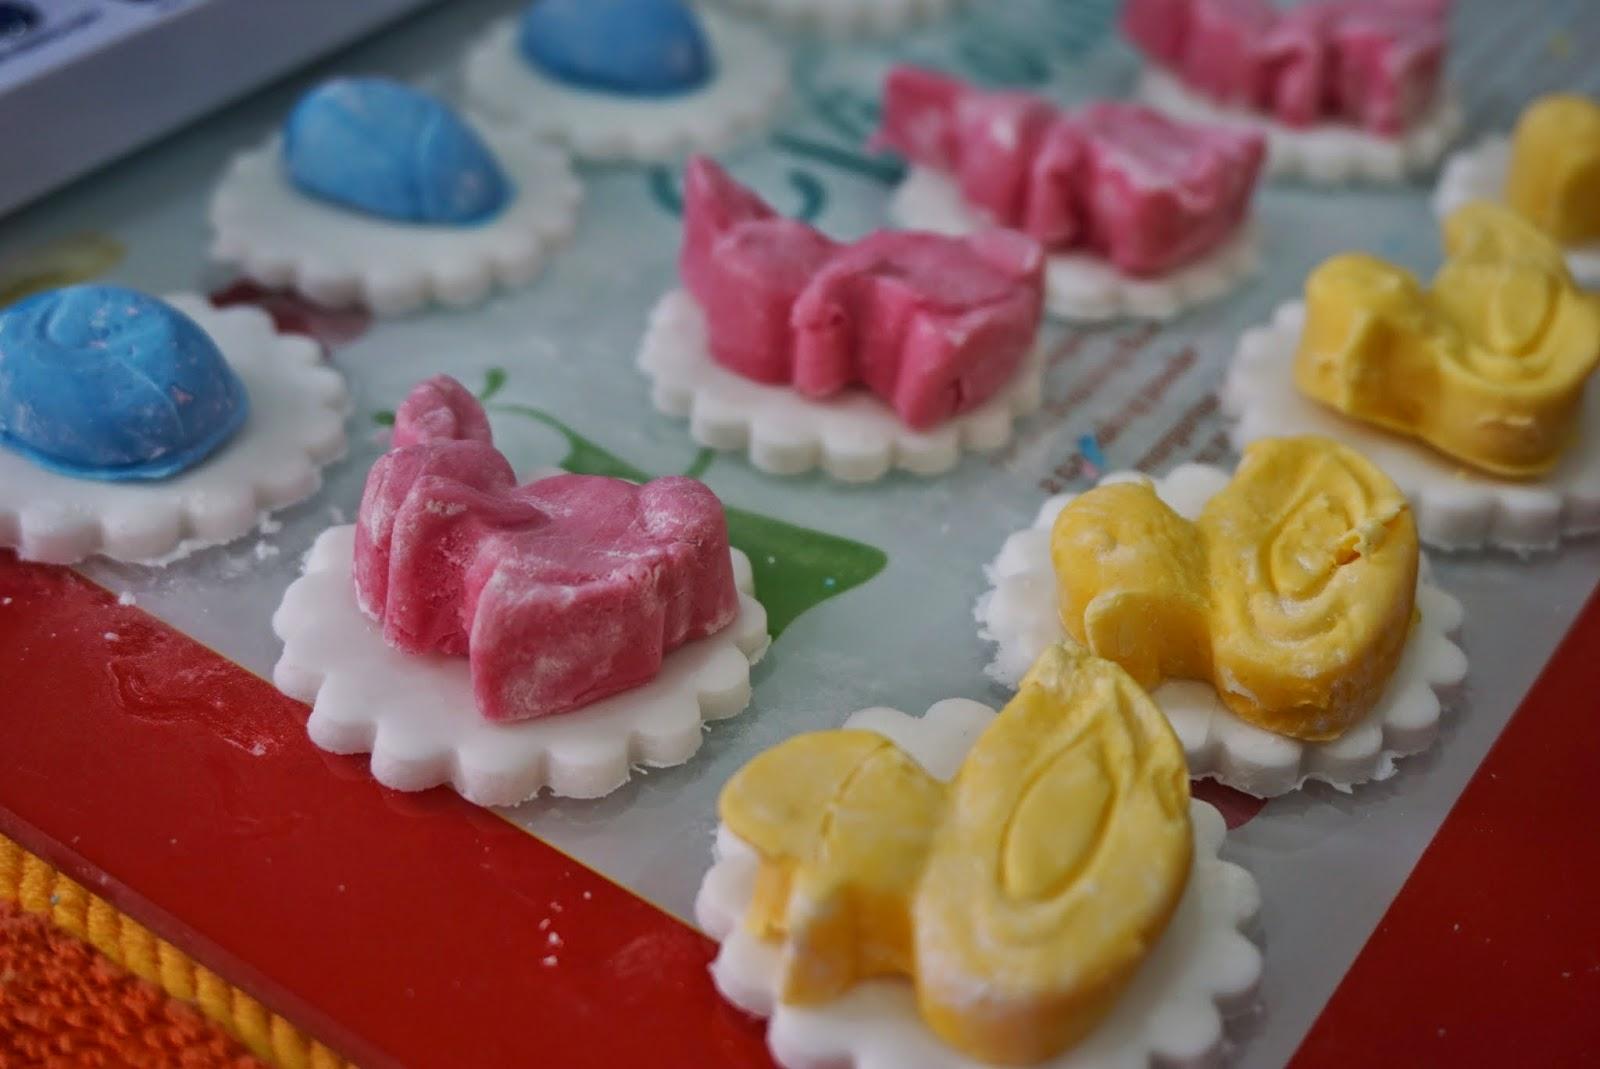 Easter Sugar craft decorations